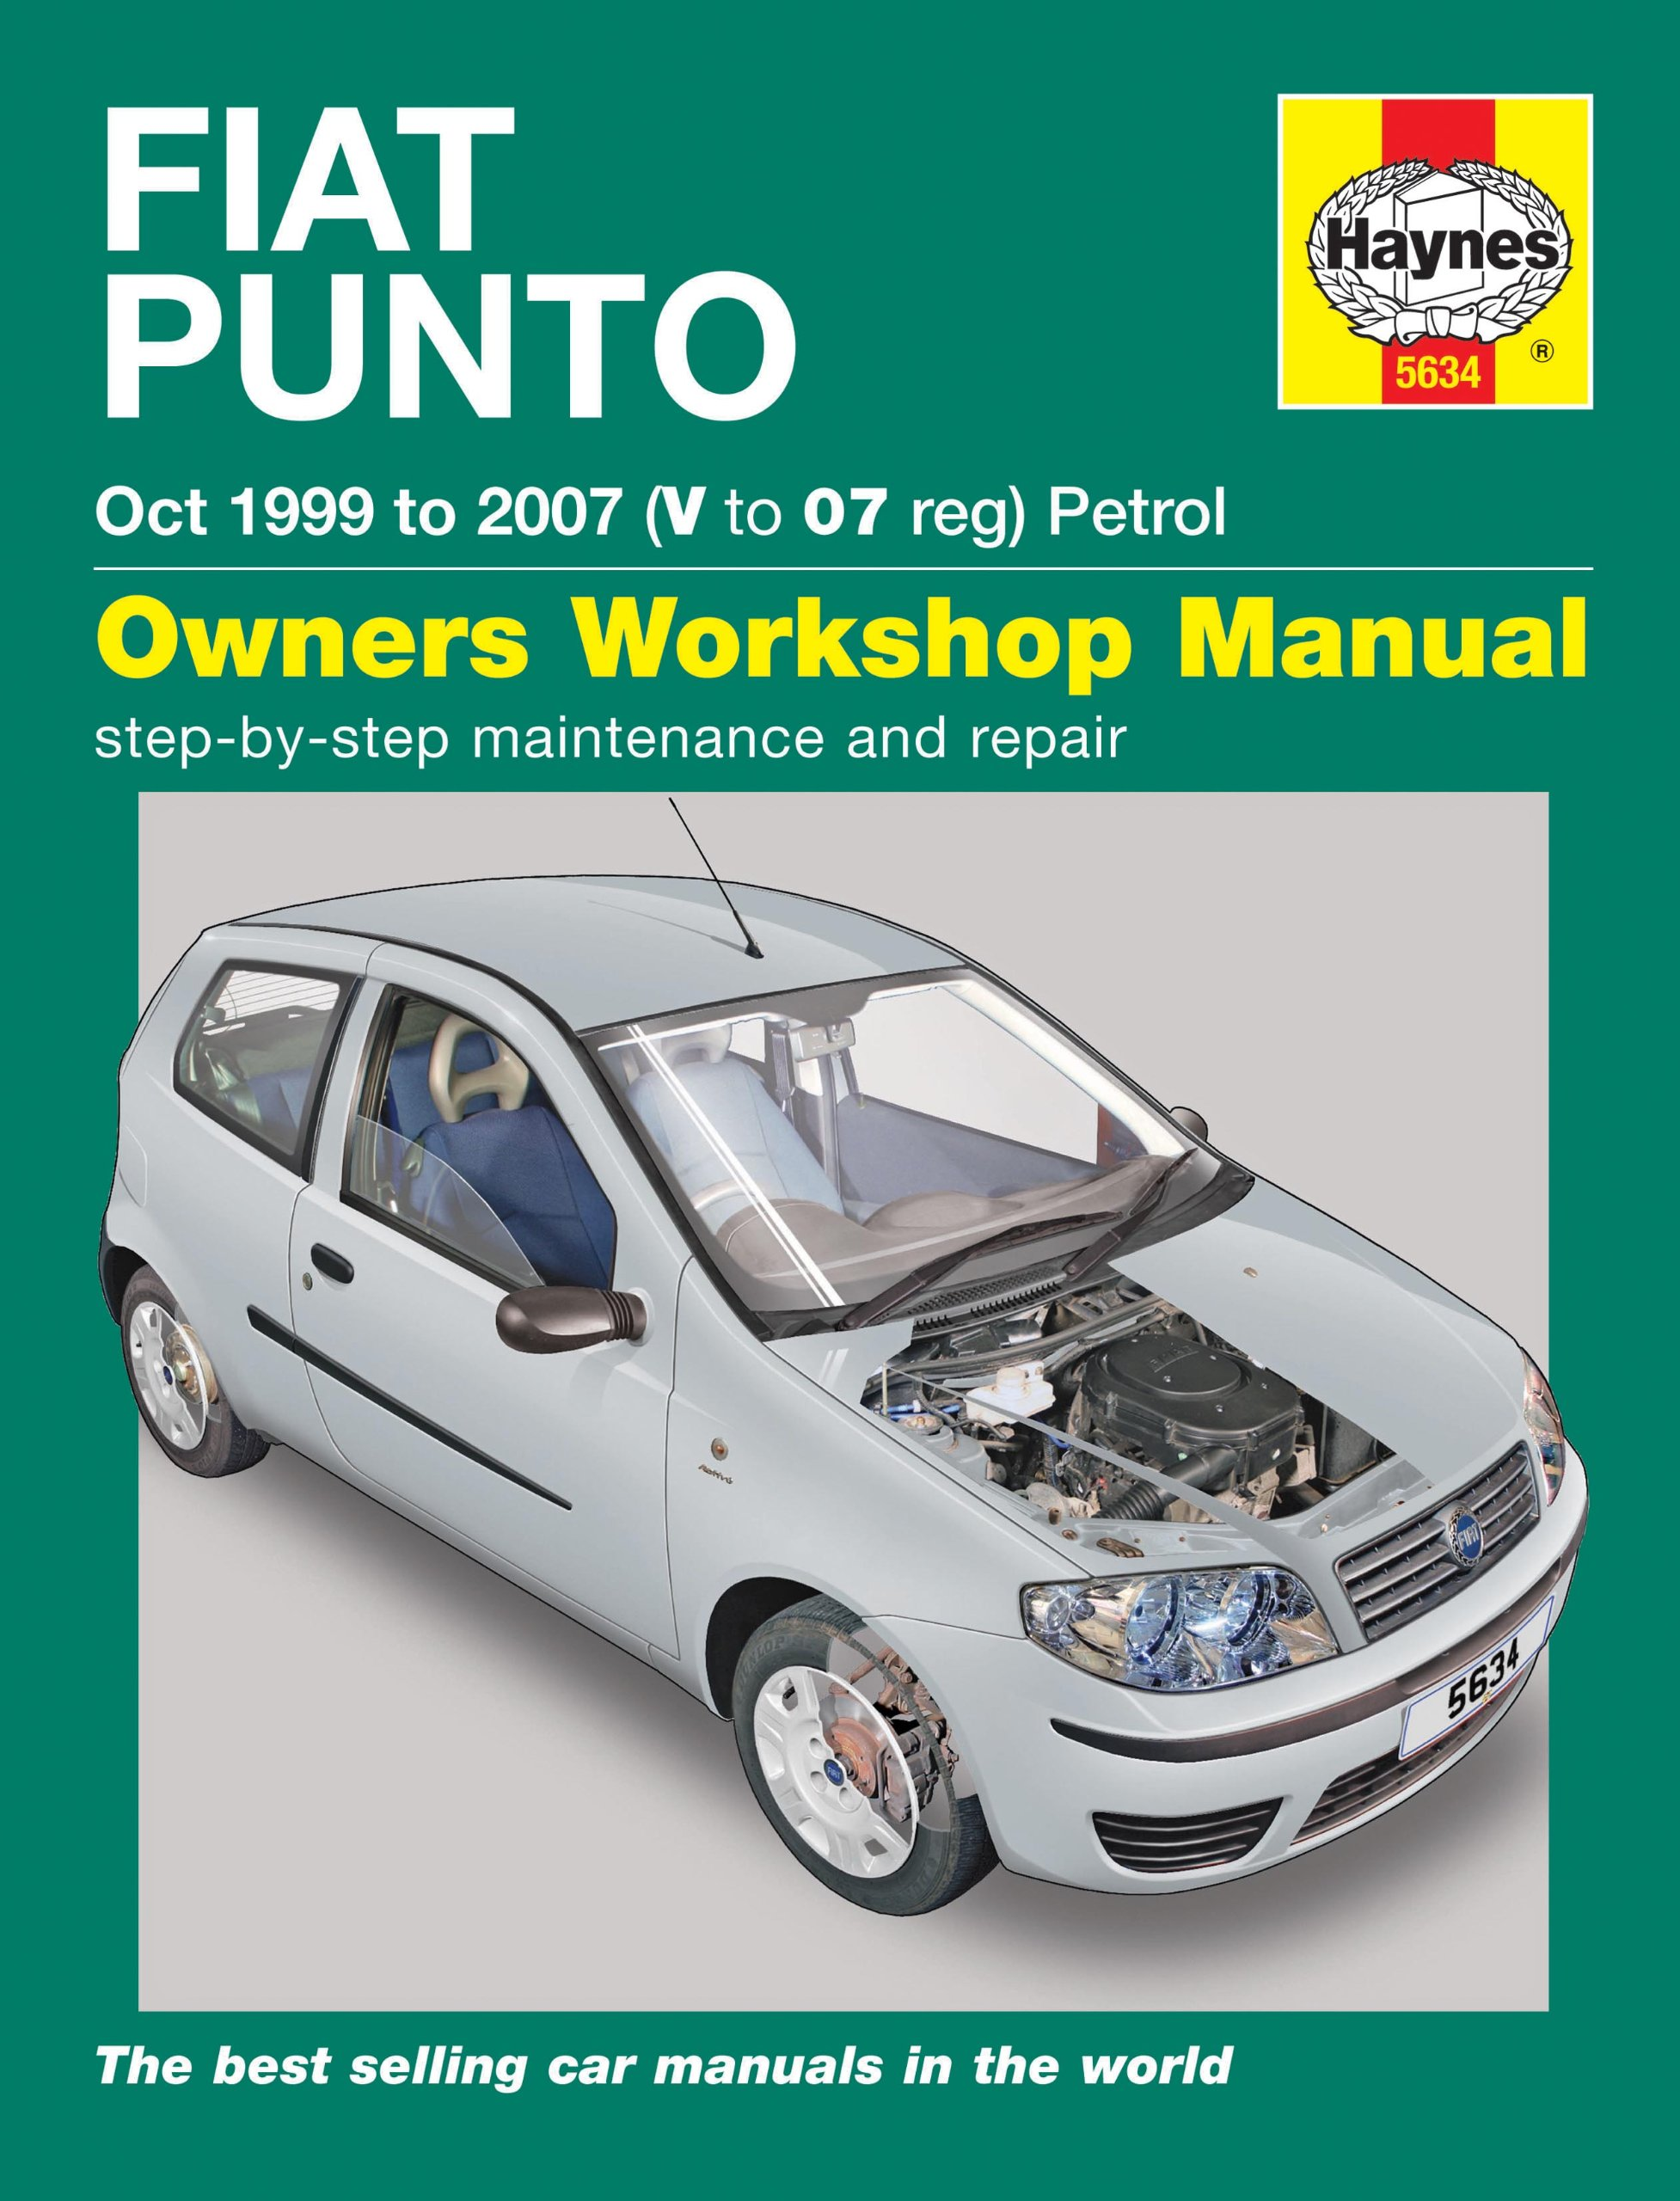 Fiat Punto Petrol Owners Workshop Manual (Haynes Manual): Amazon.co.uk:  John Mead: 9781785213748: Books